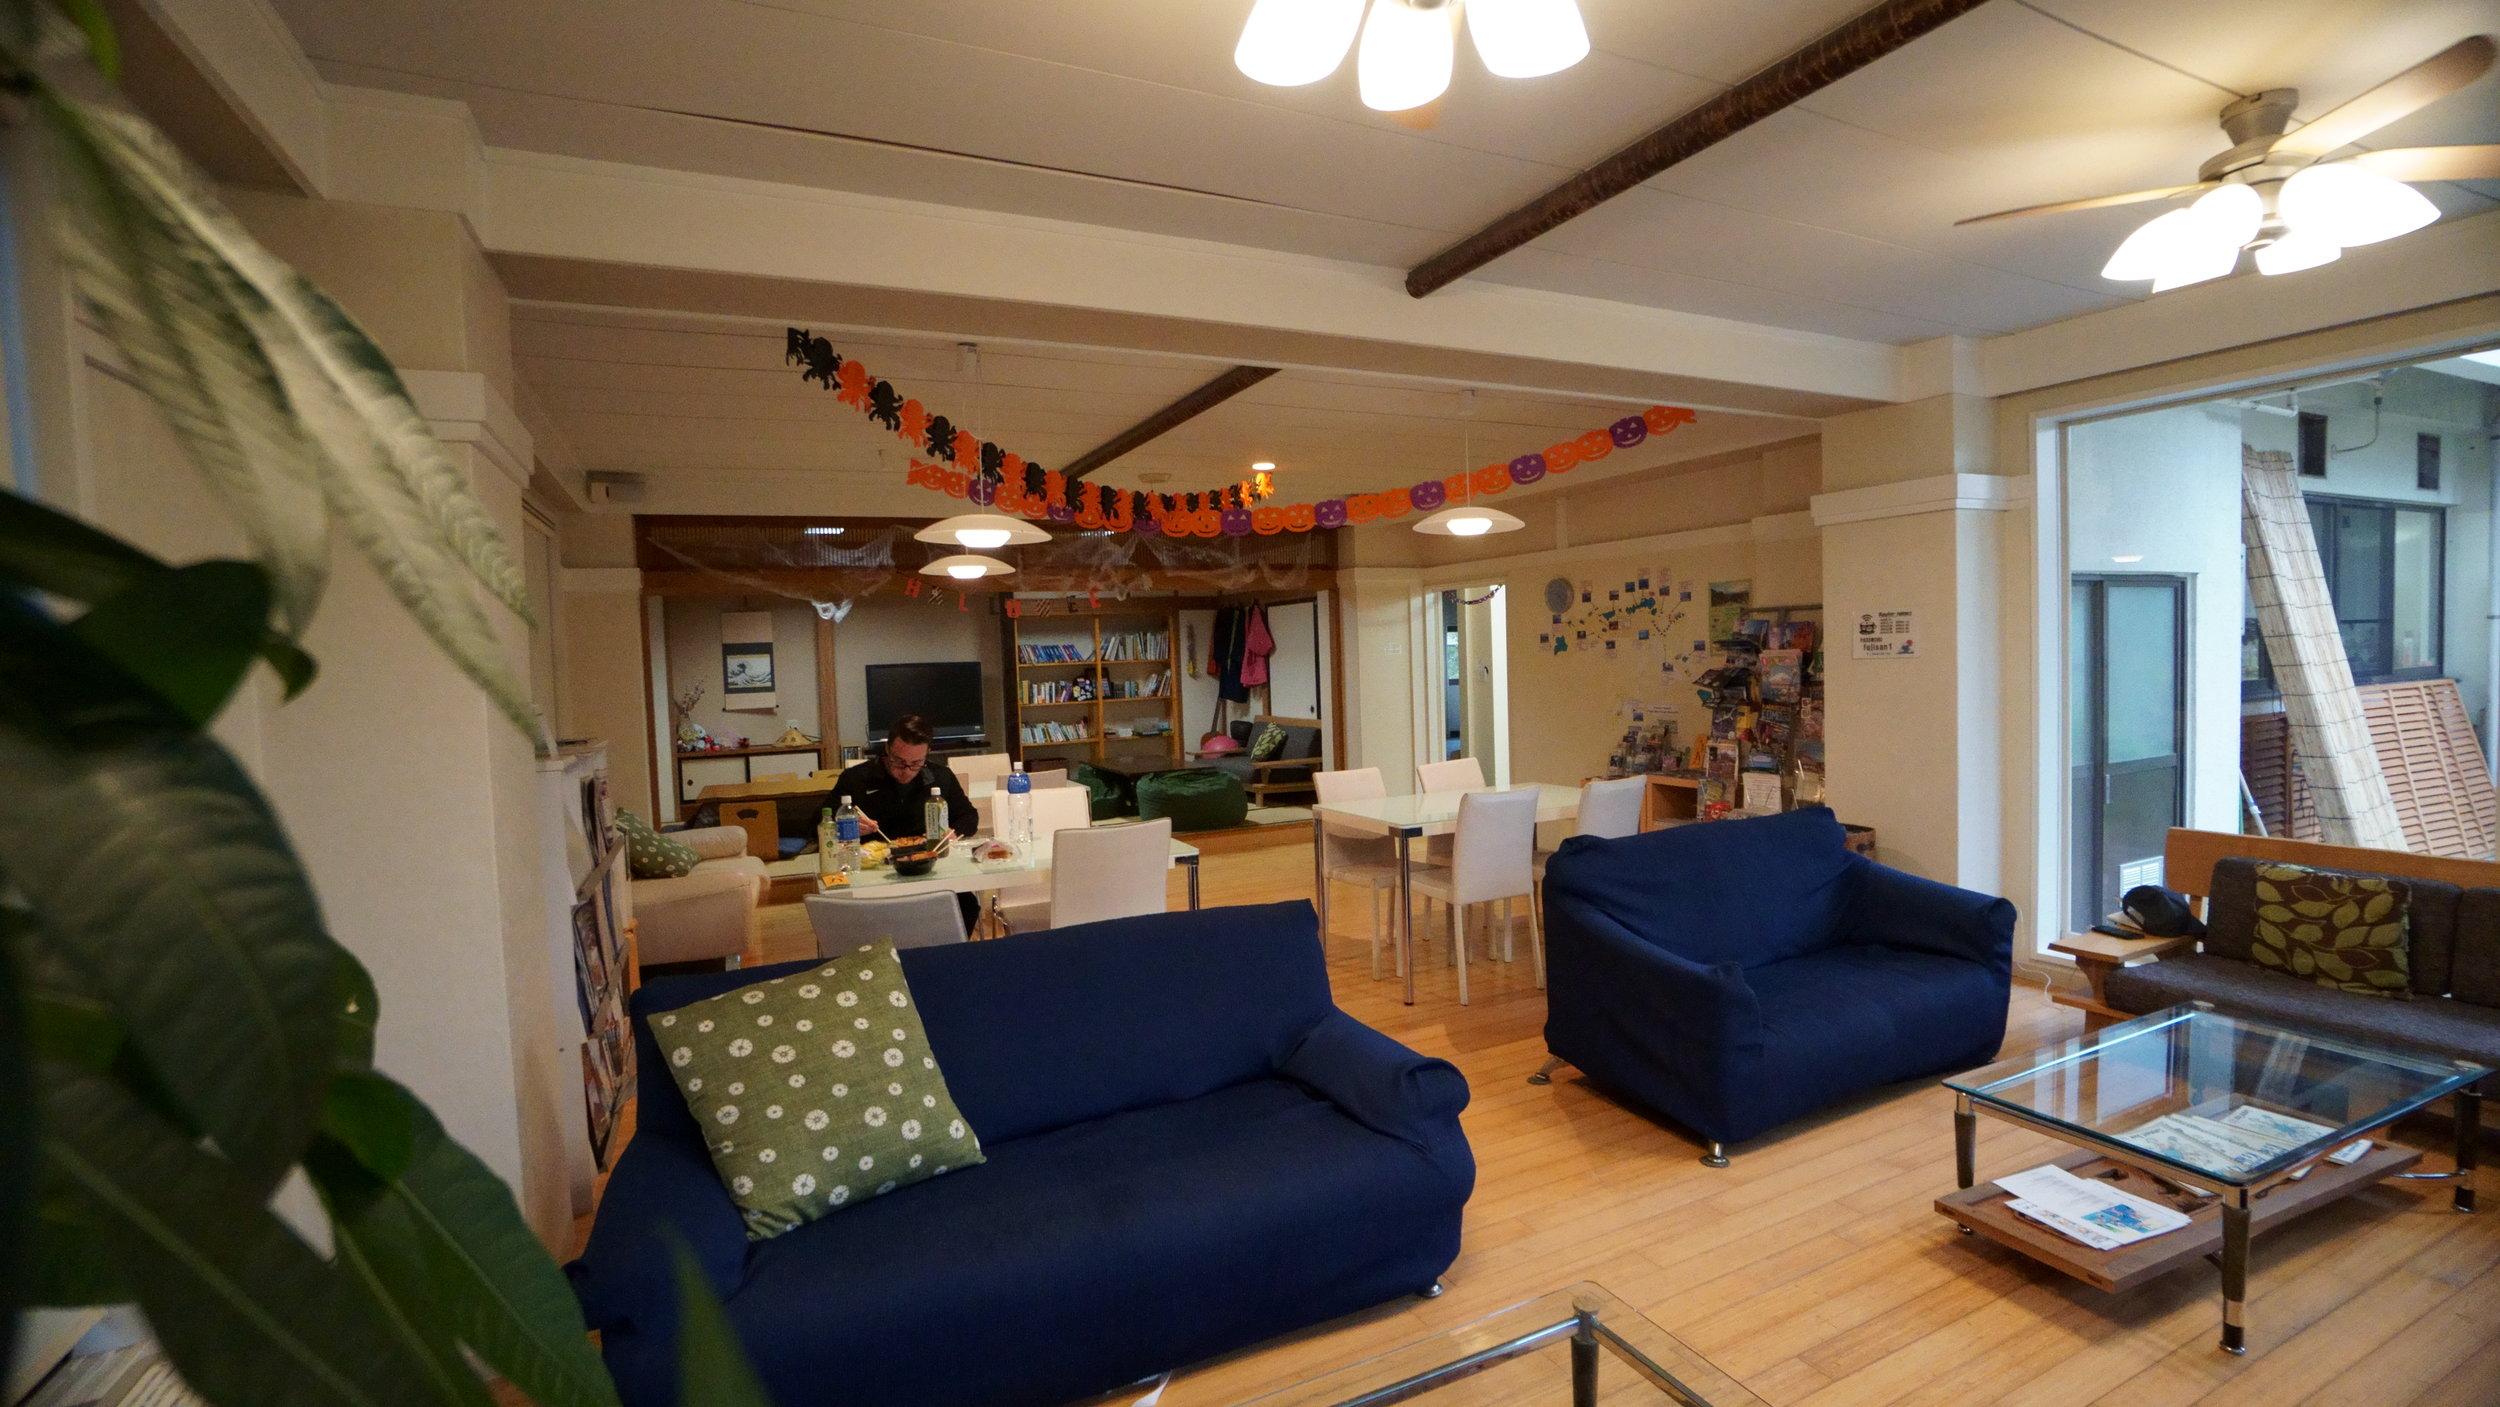 polywander-where-to-stay-in-kawaguchiko-k-s-house-fuji-hostel